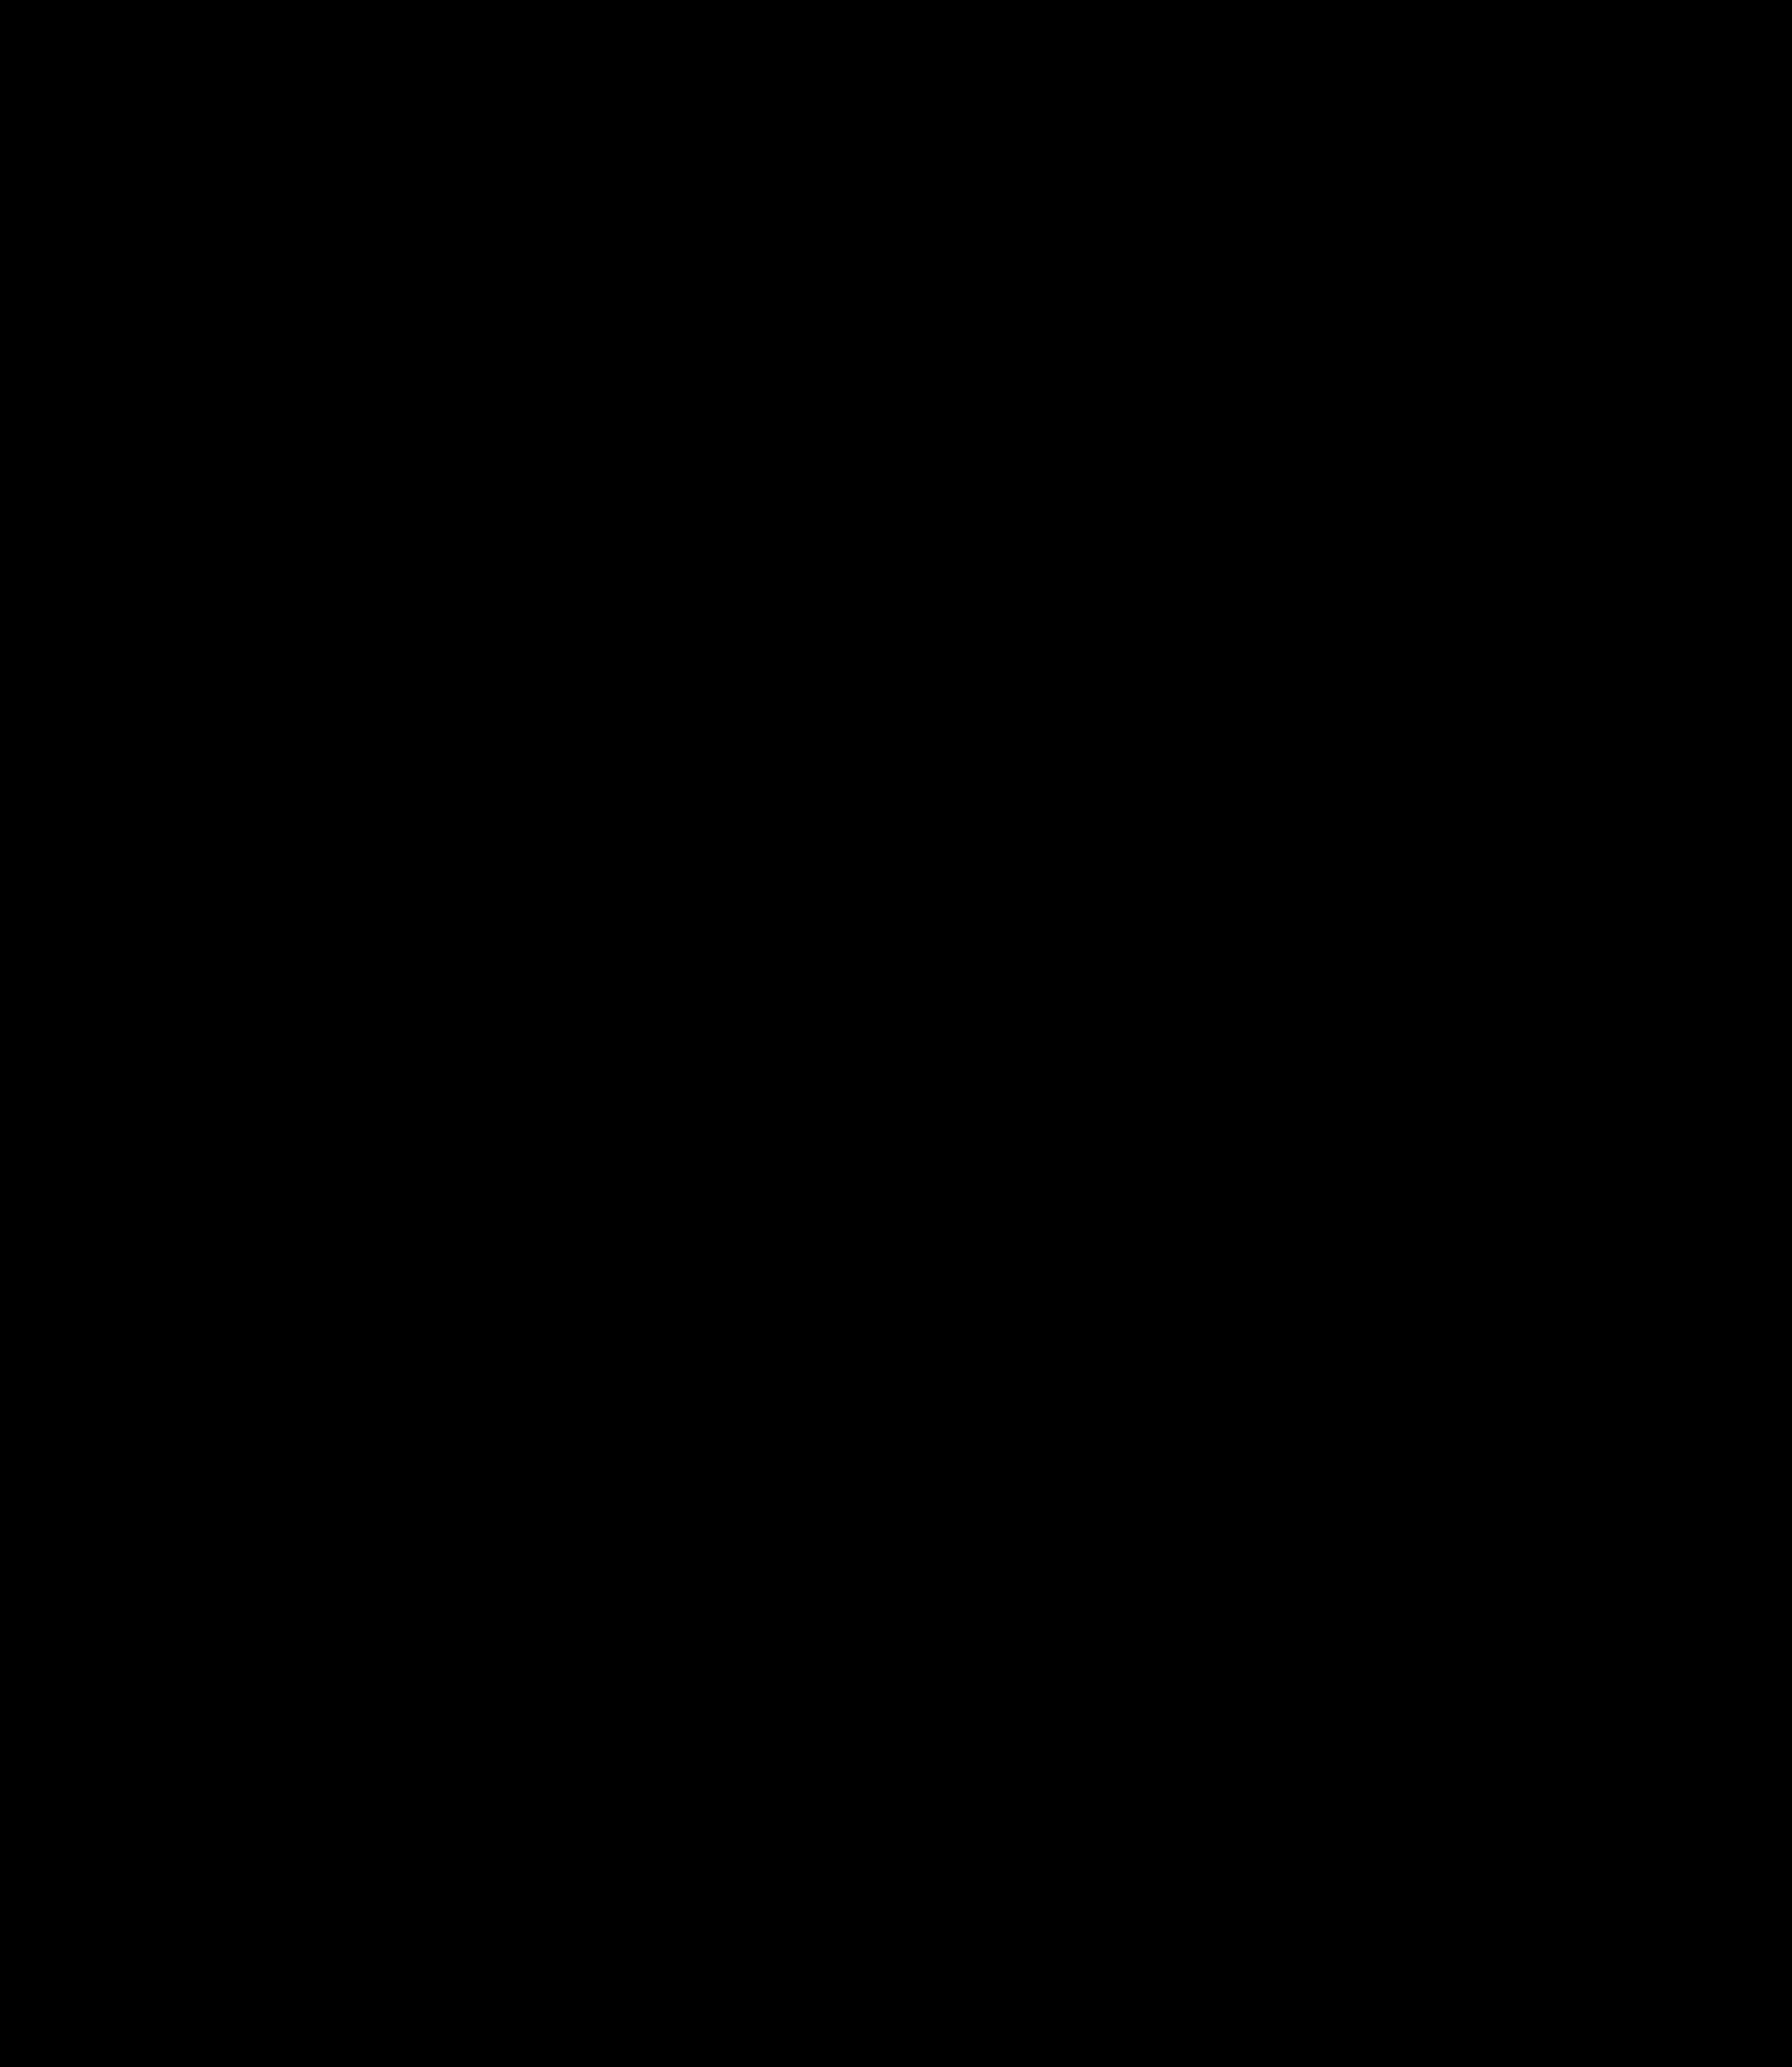 2020x2330 Drawn Ballerina Outline